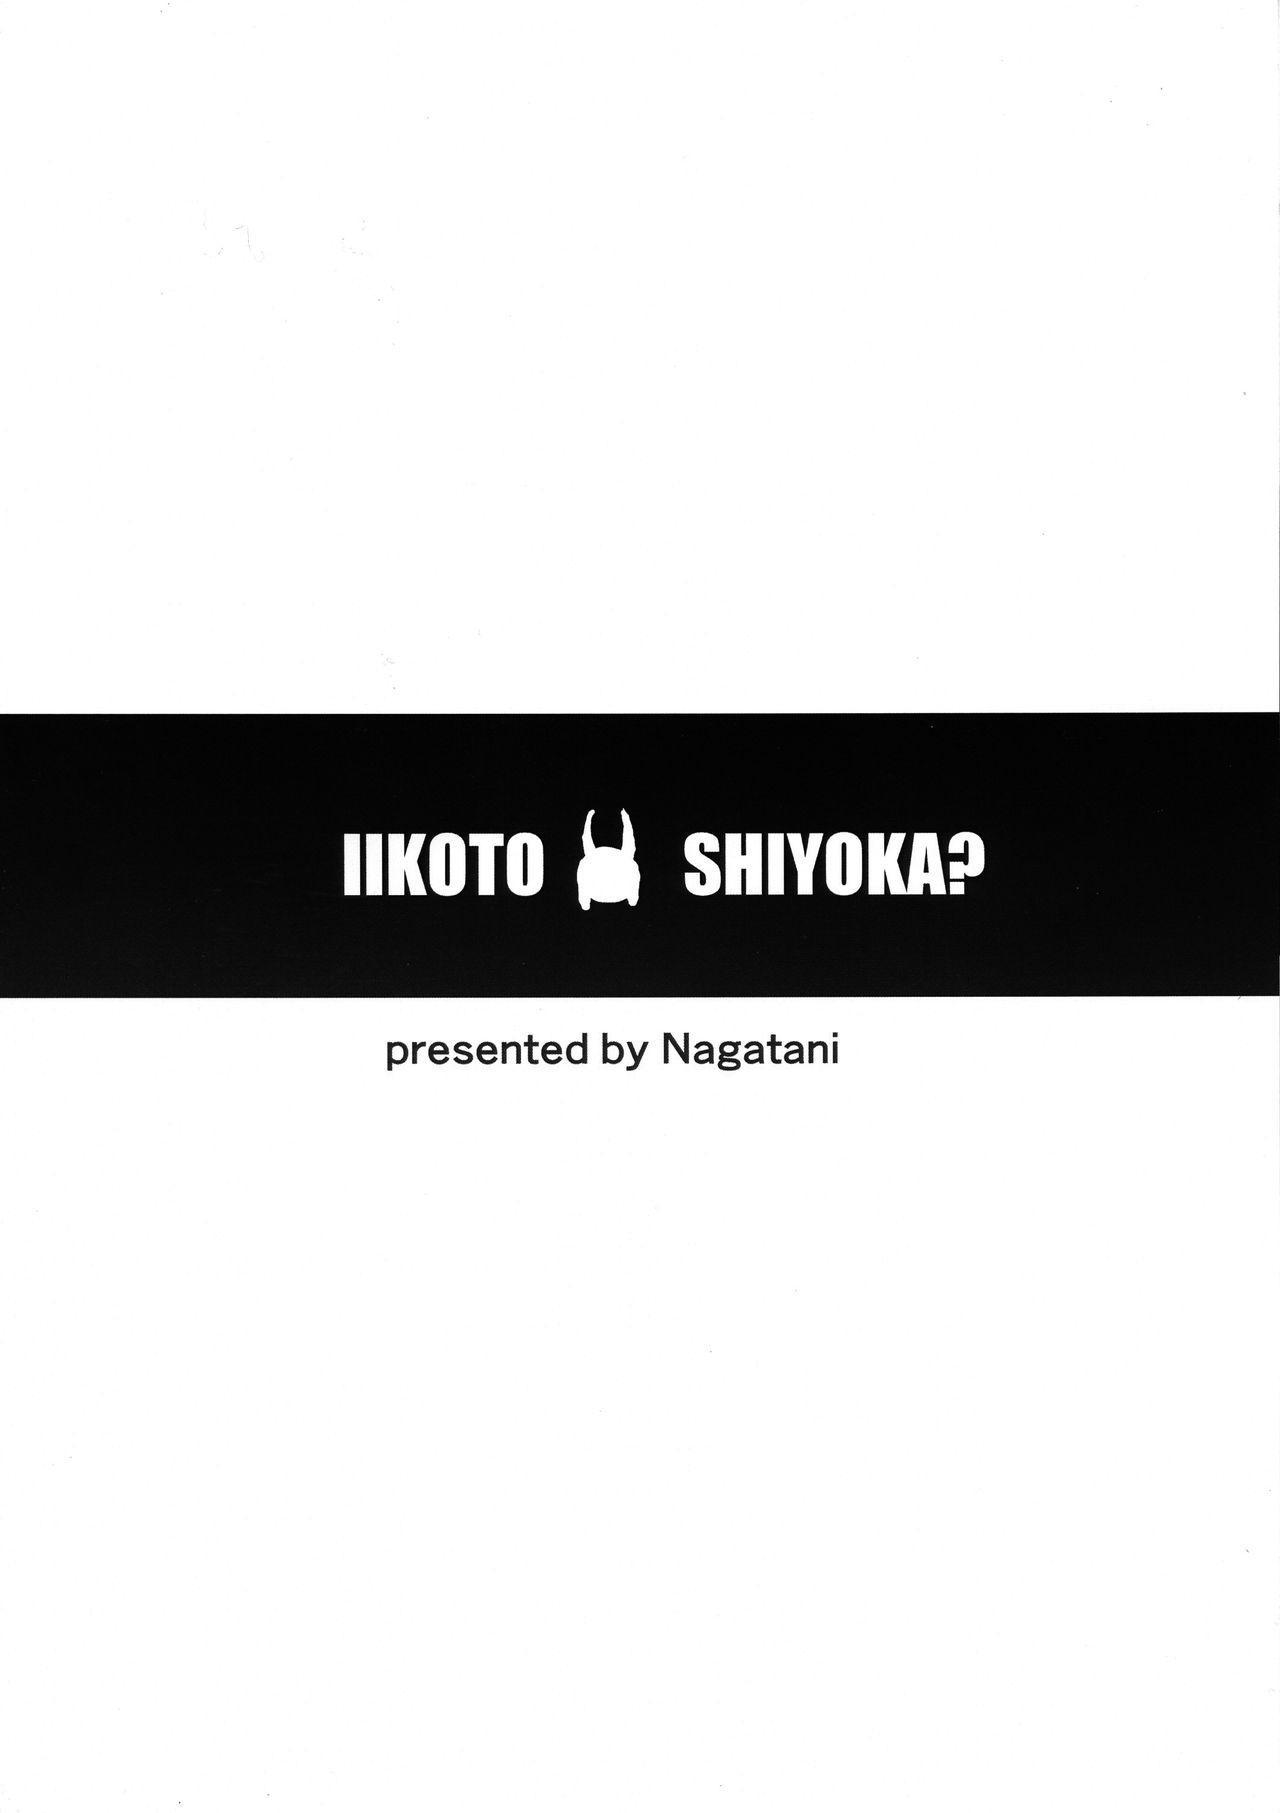 Iikoto Shiyo ka? 2